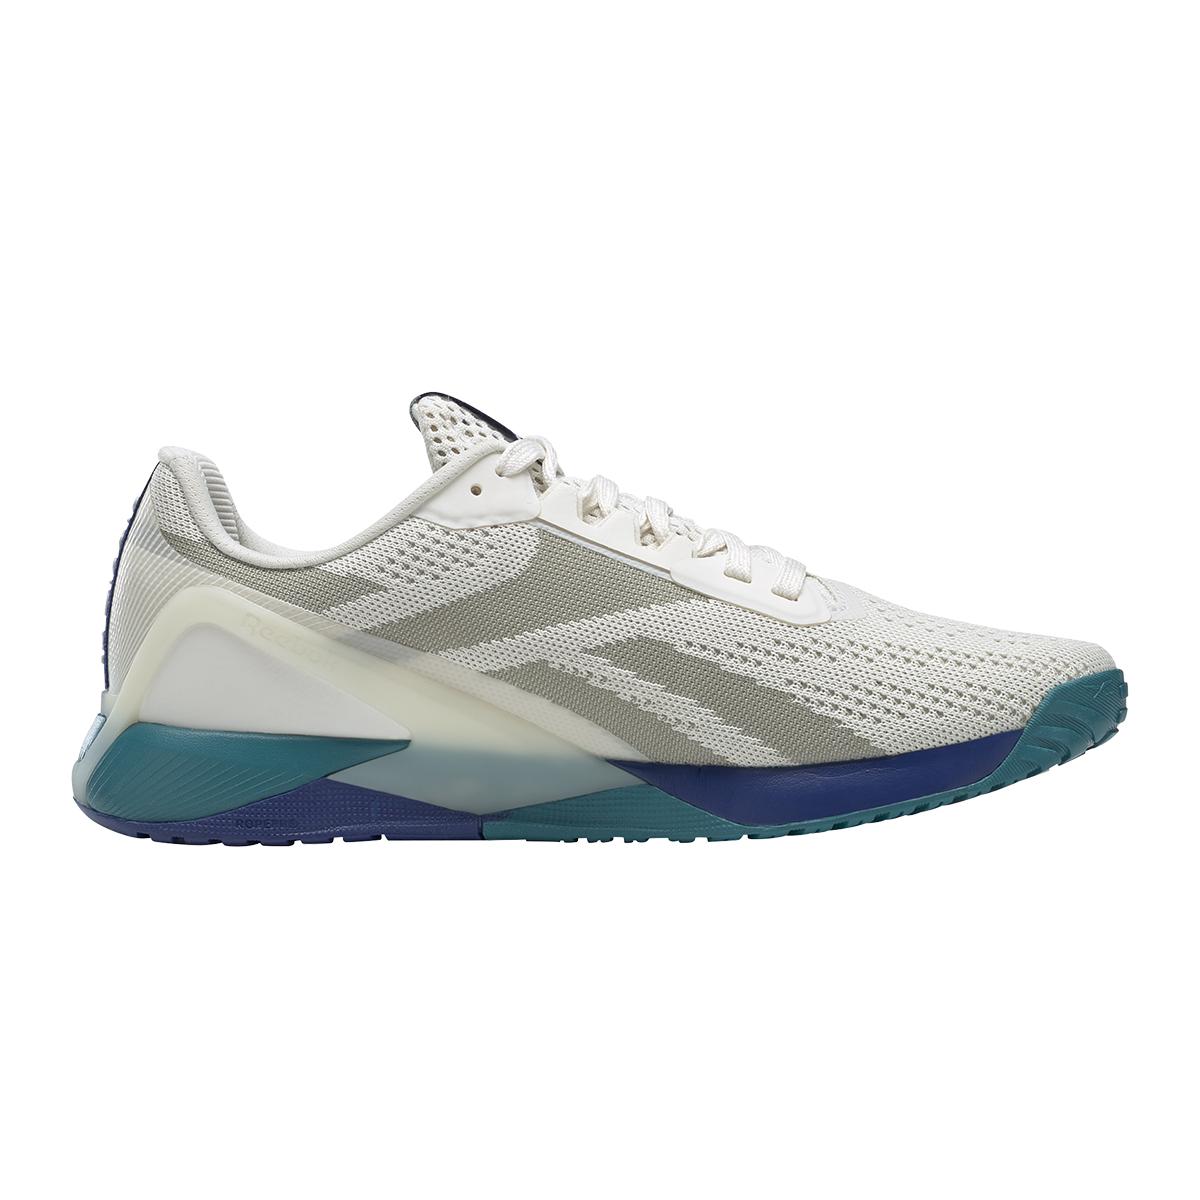 Men's Reebok Nano X1 Training Shoe - Color: Chalk/Classic Cobalt/Seaport Teal   - Size: 6 - Width: Regular, Chalk/Classic Cobalt/Seaport Teal, large, image 1